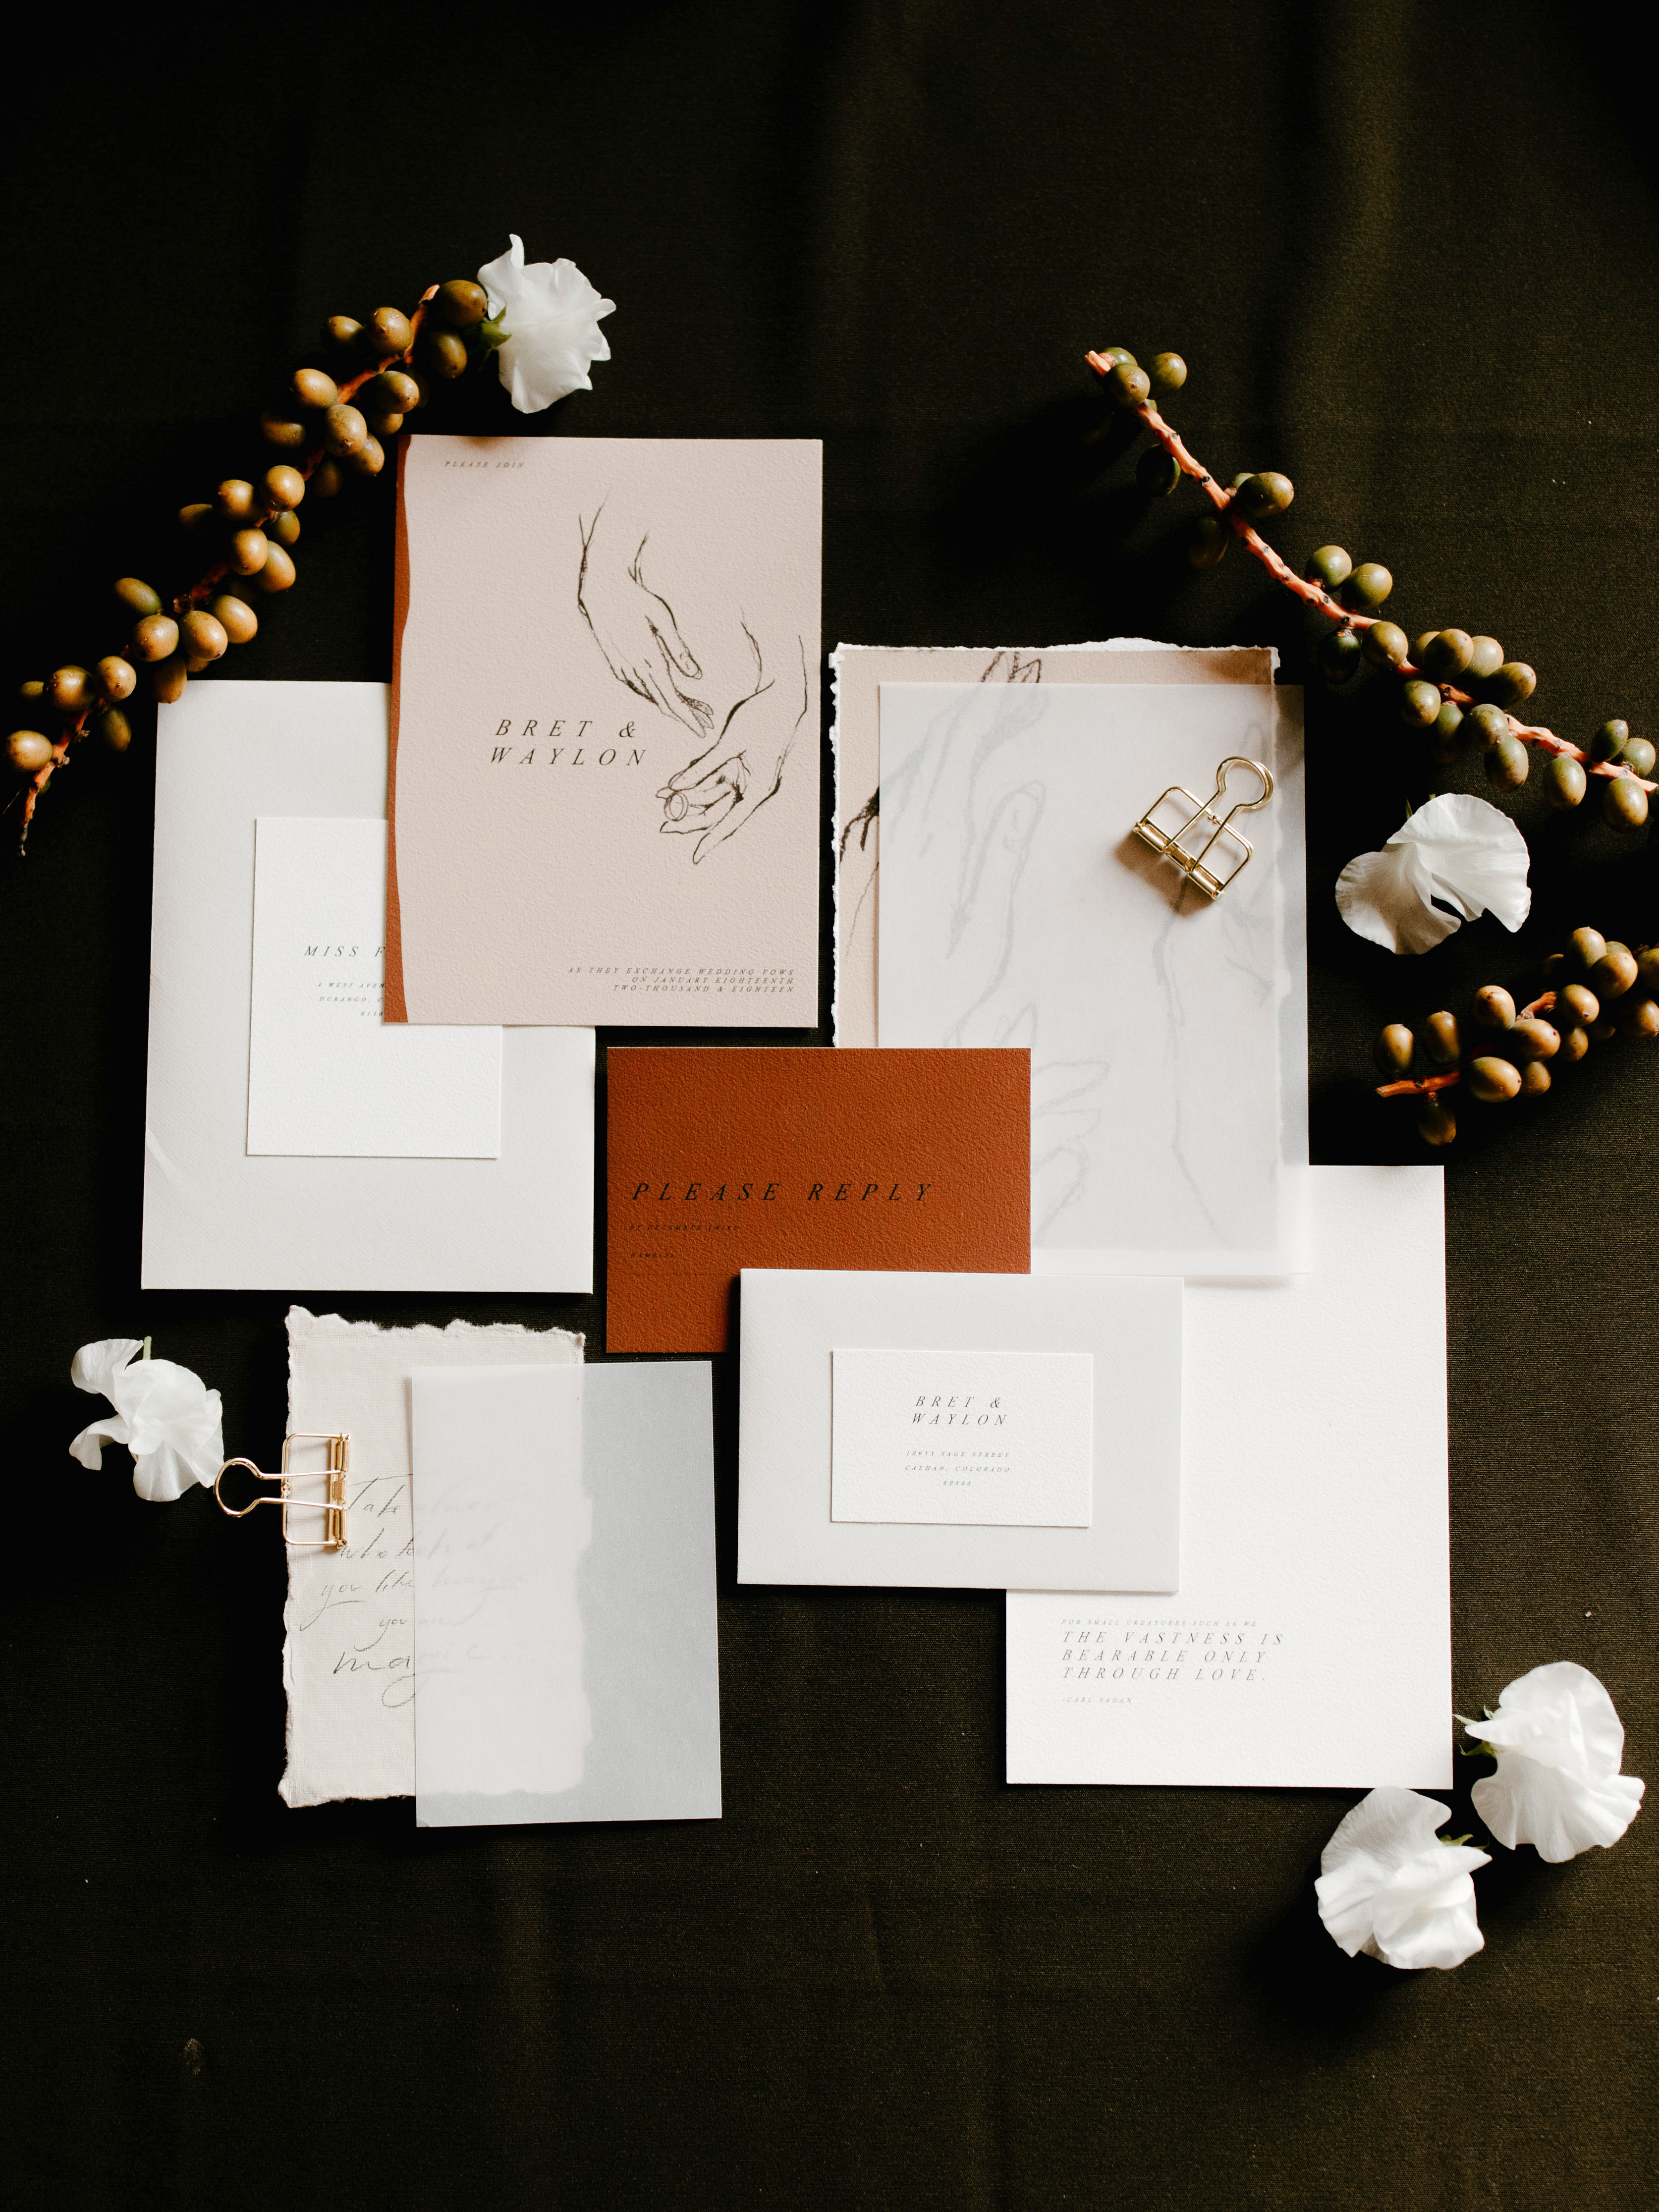 wedding invitation negative space drawn hands art